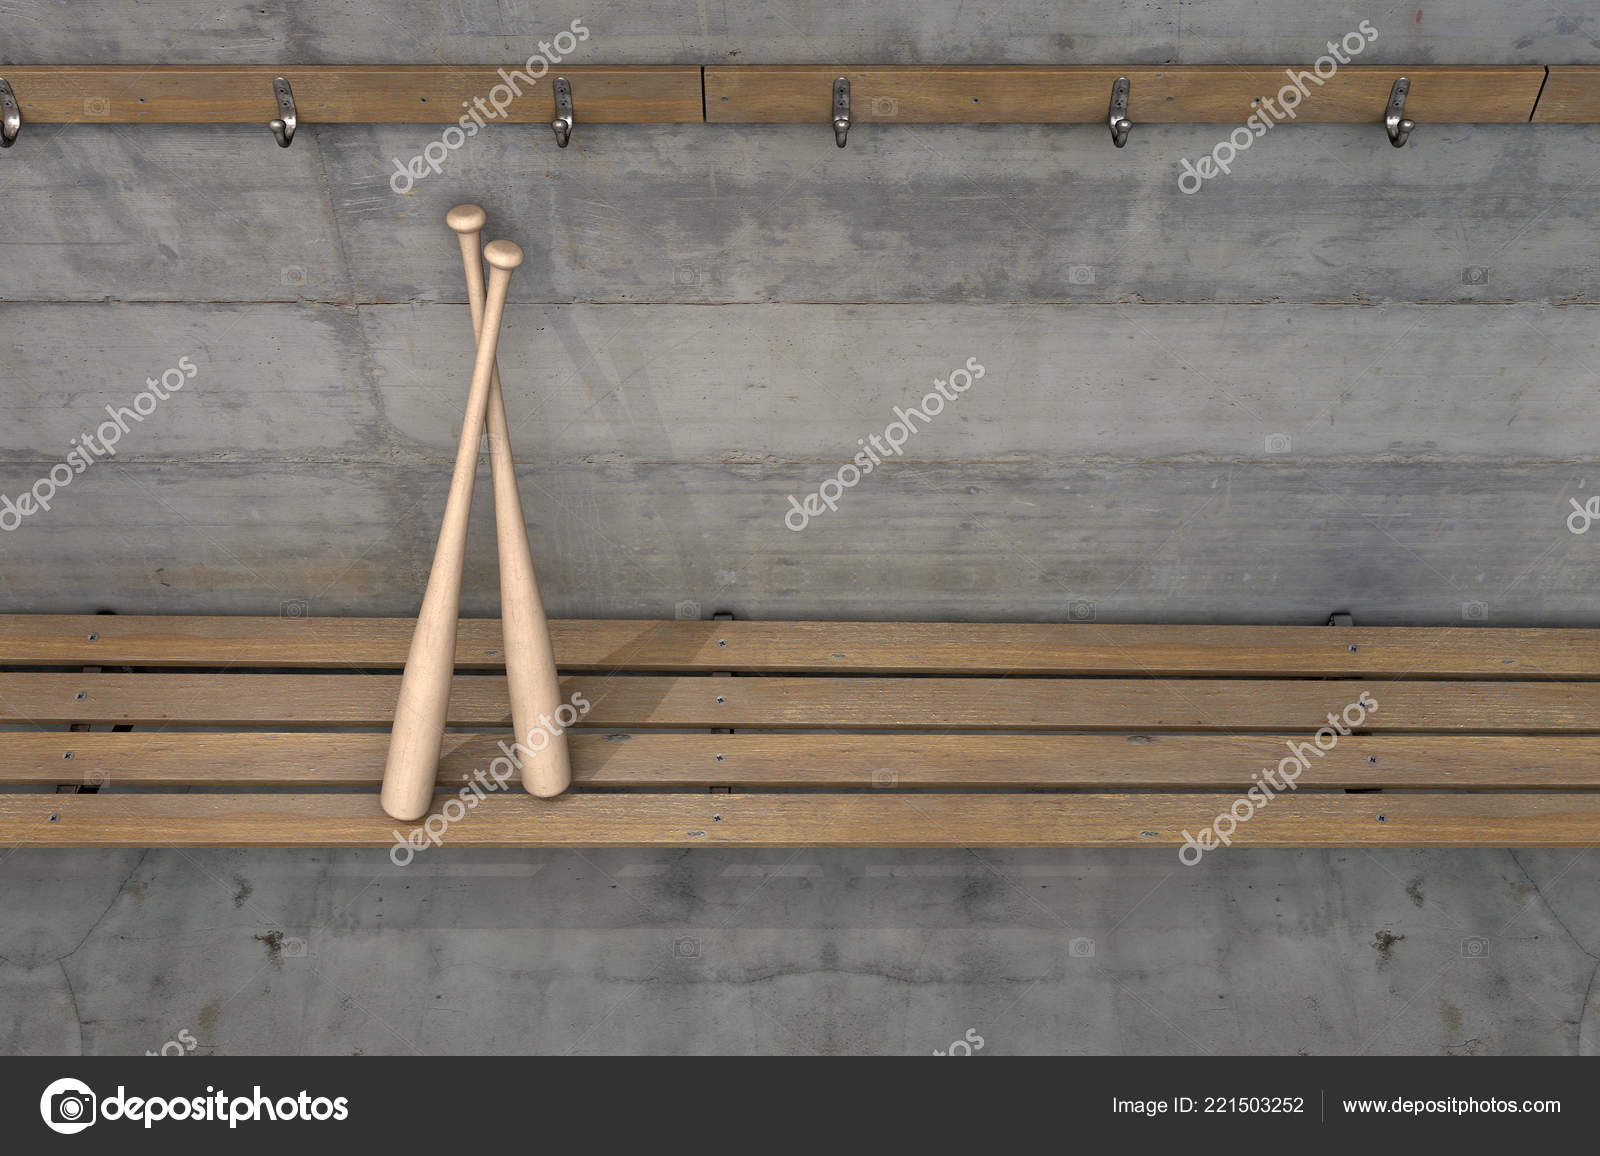 Miraculous Two Baseball Bats Wooden Bench Rundown Sports Locker Change Machost Co Dining Chair Design Ideas Machostcouk